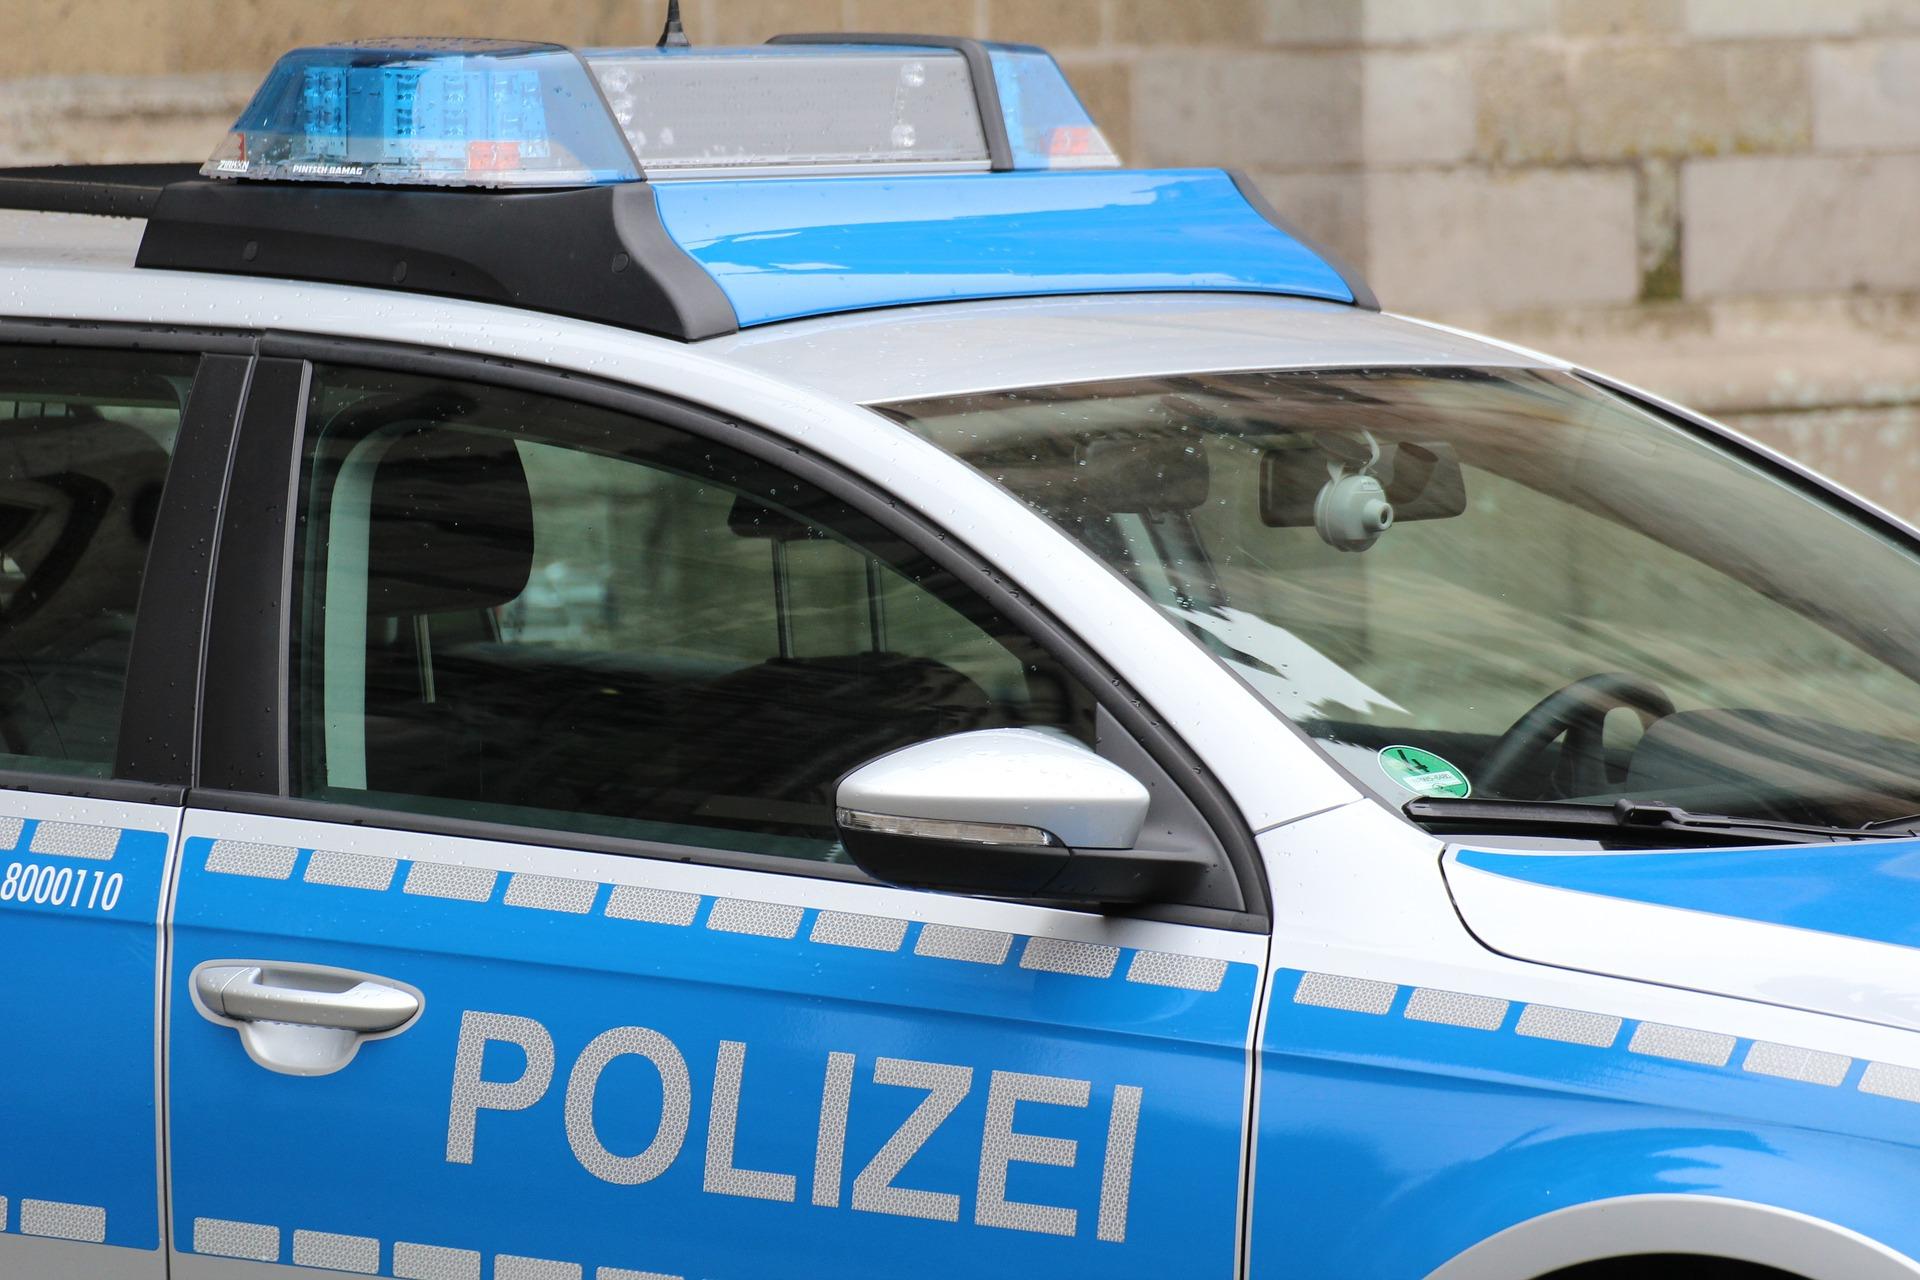 17-jähriger Kradfahrer bei Unfall schwer verletzt